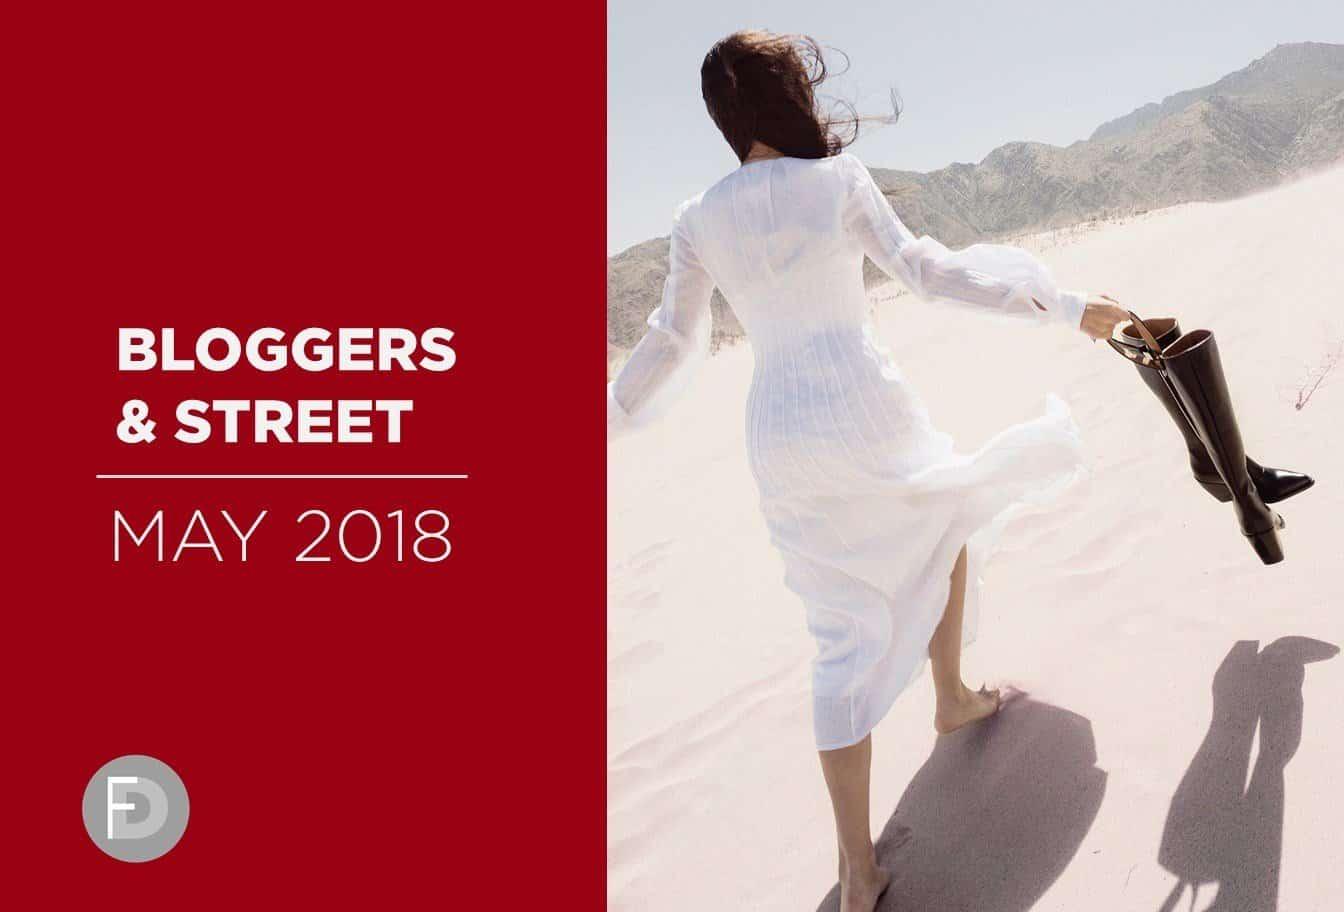 Bloggers & Street May 2018